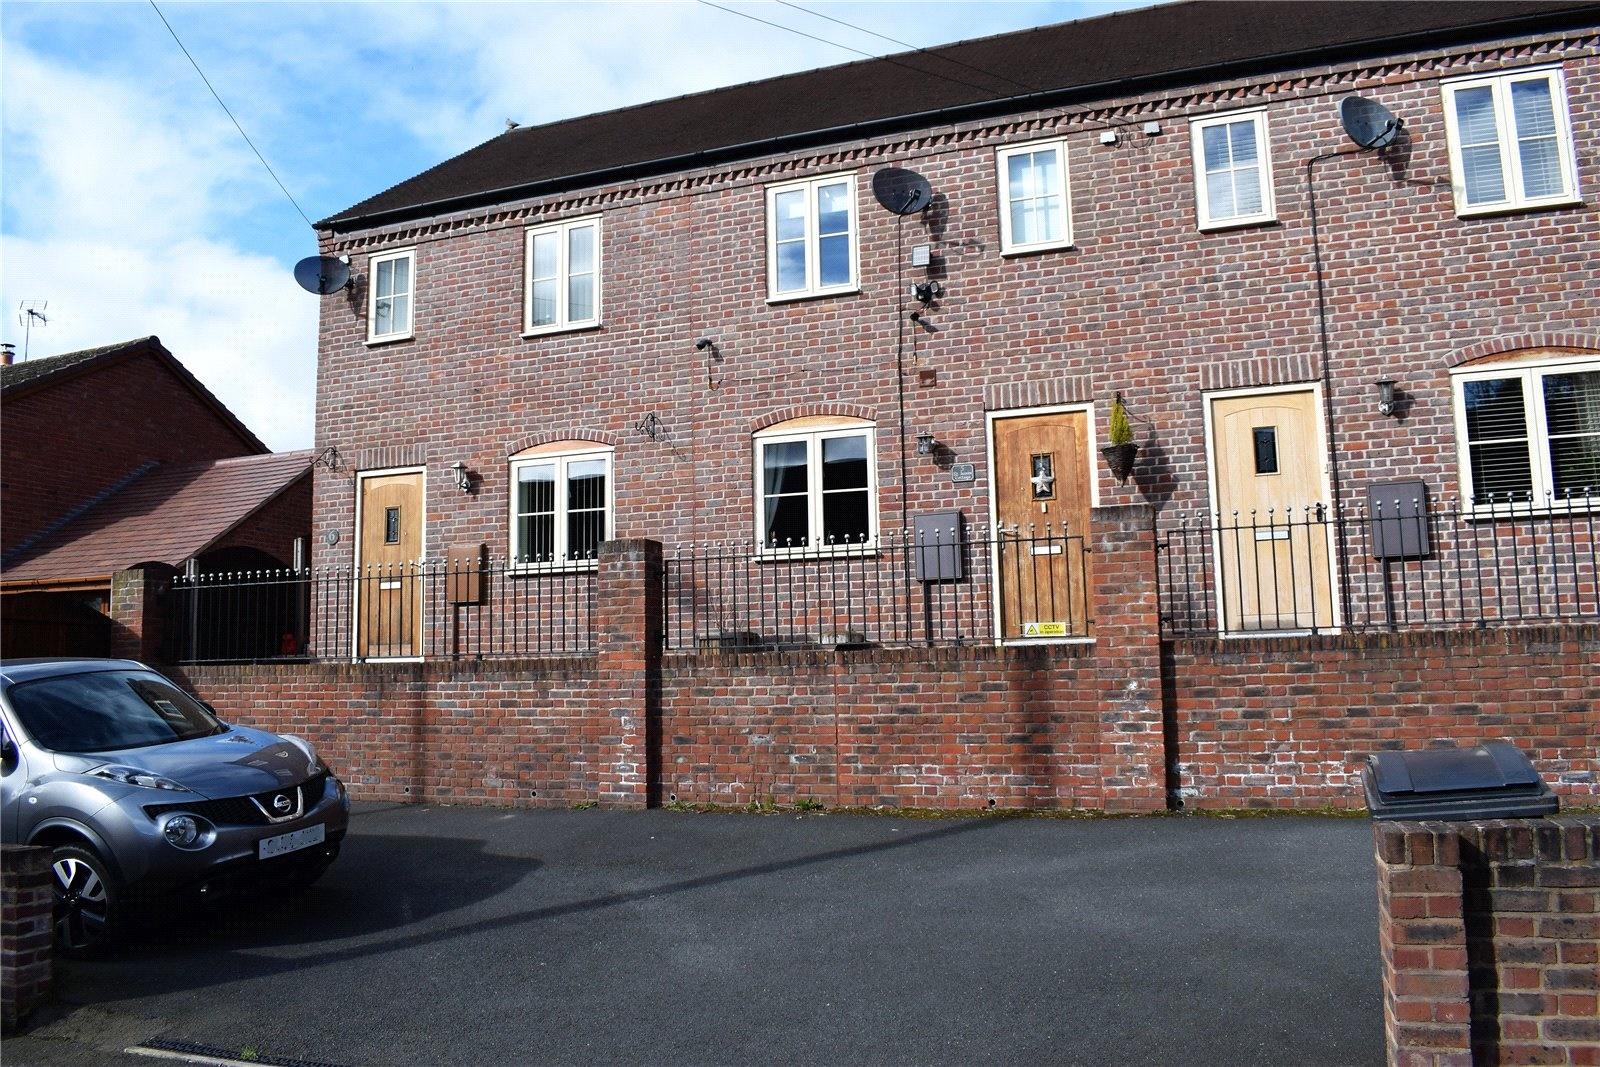 6 St. James Cottage, Stourbridge Road, Bridgnorth, Shropshire, WV15